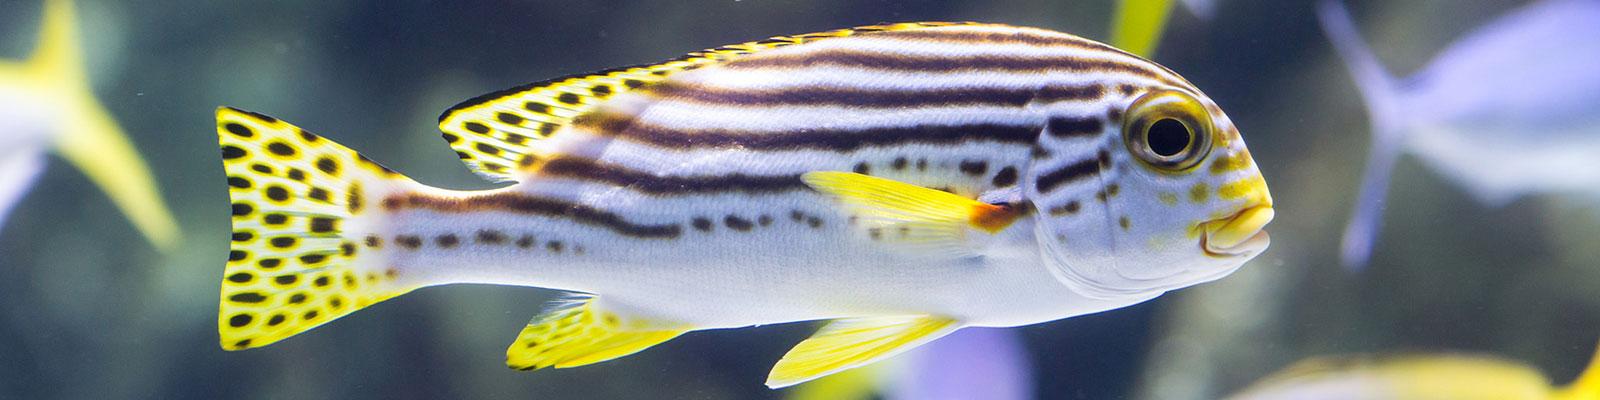 Visiter l'aquarium de La Rochelle